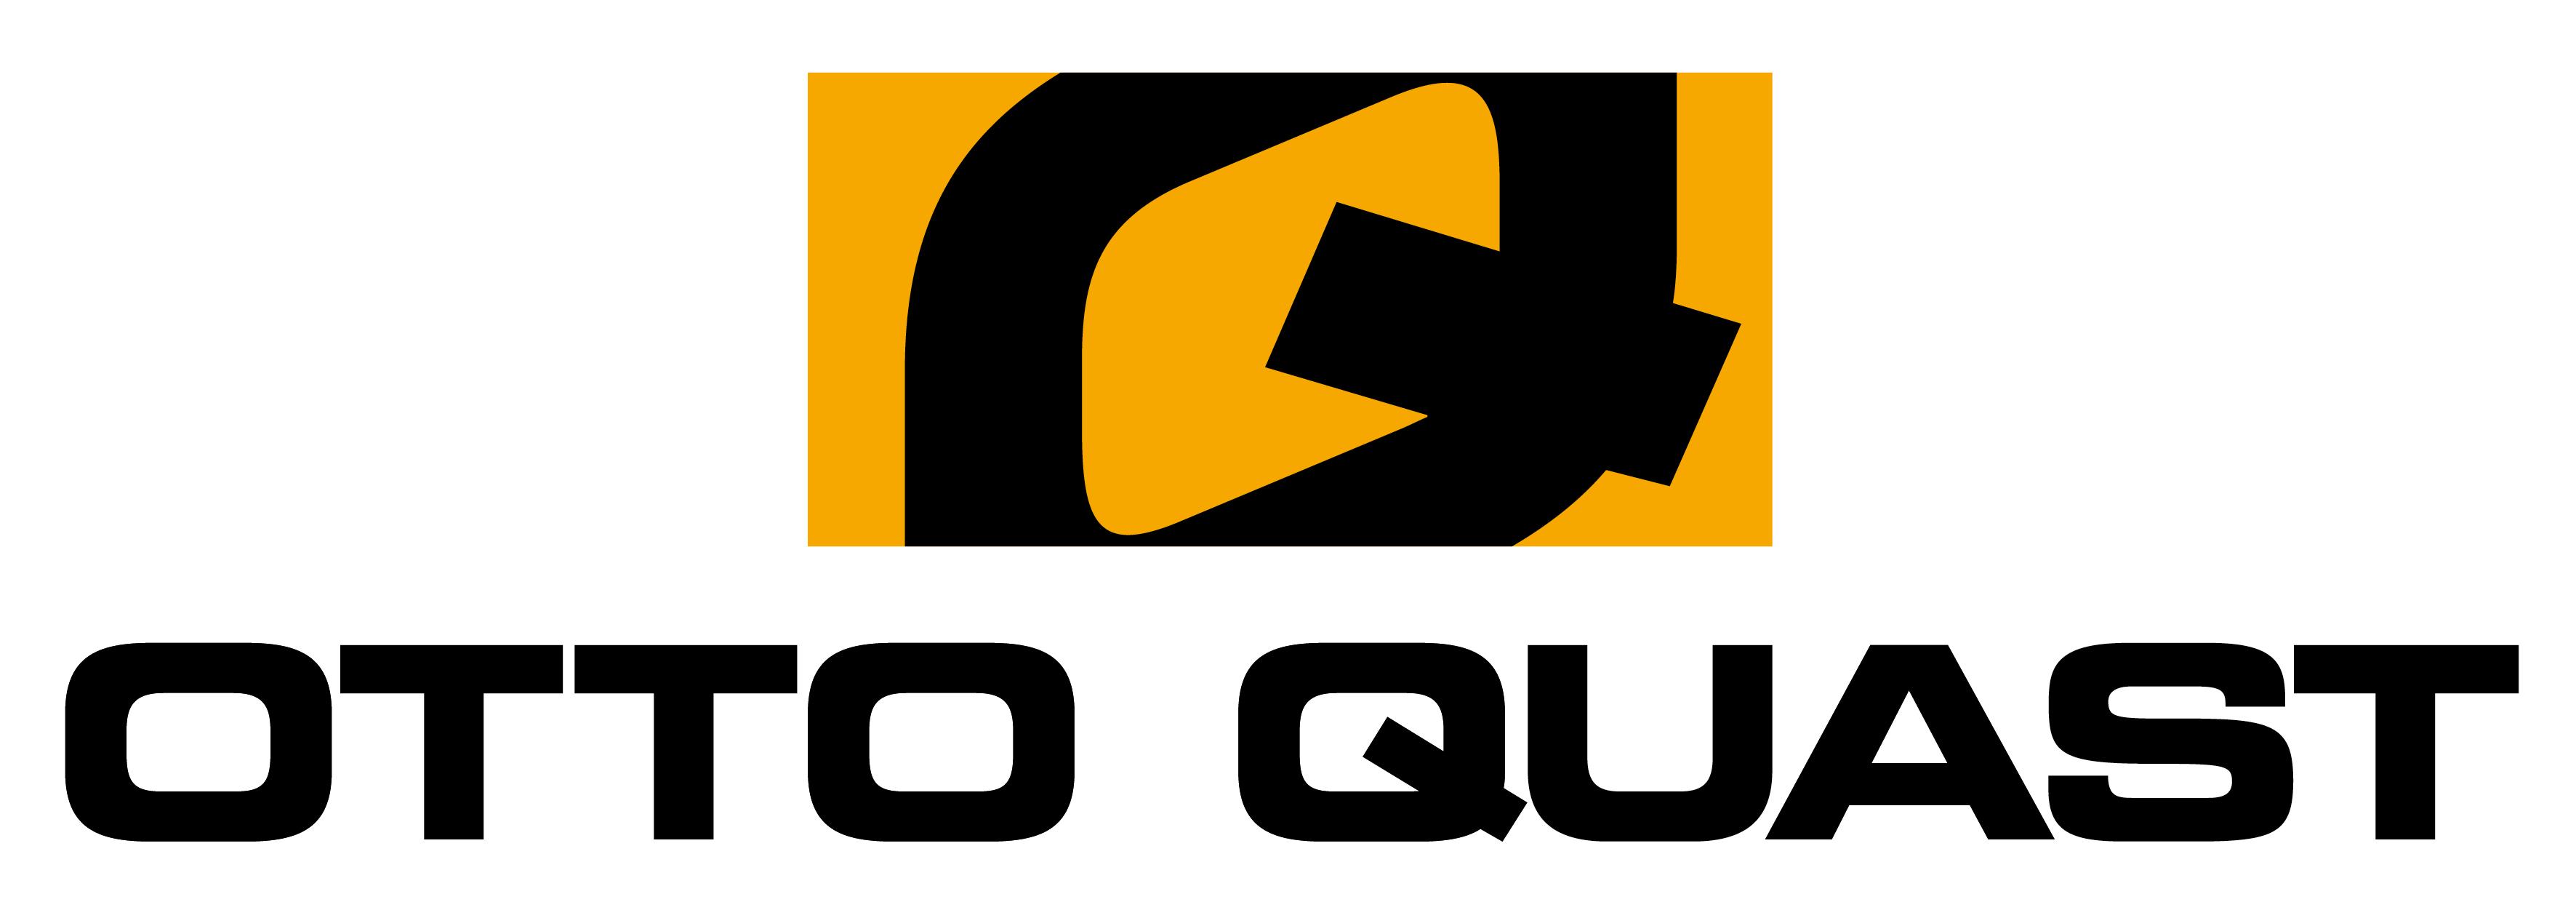 quast_standard_4c_png